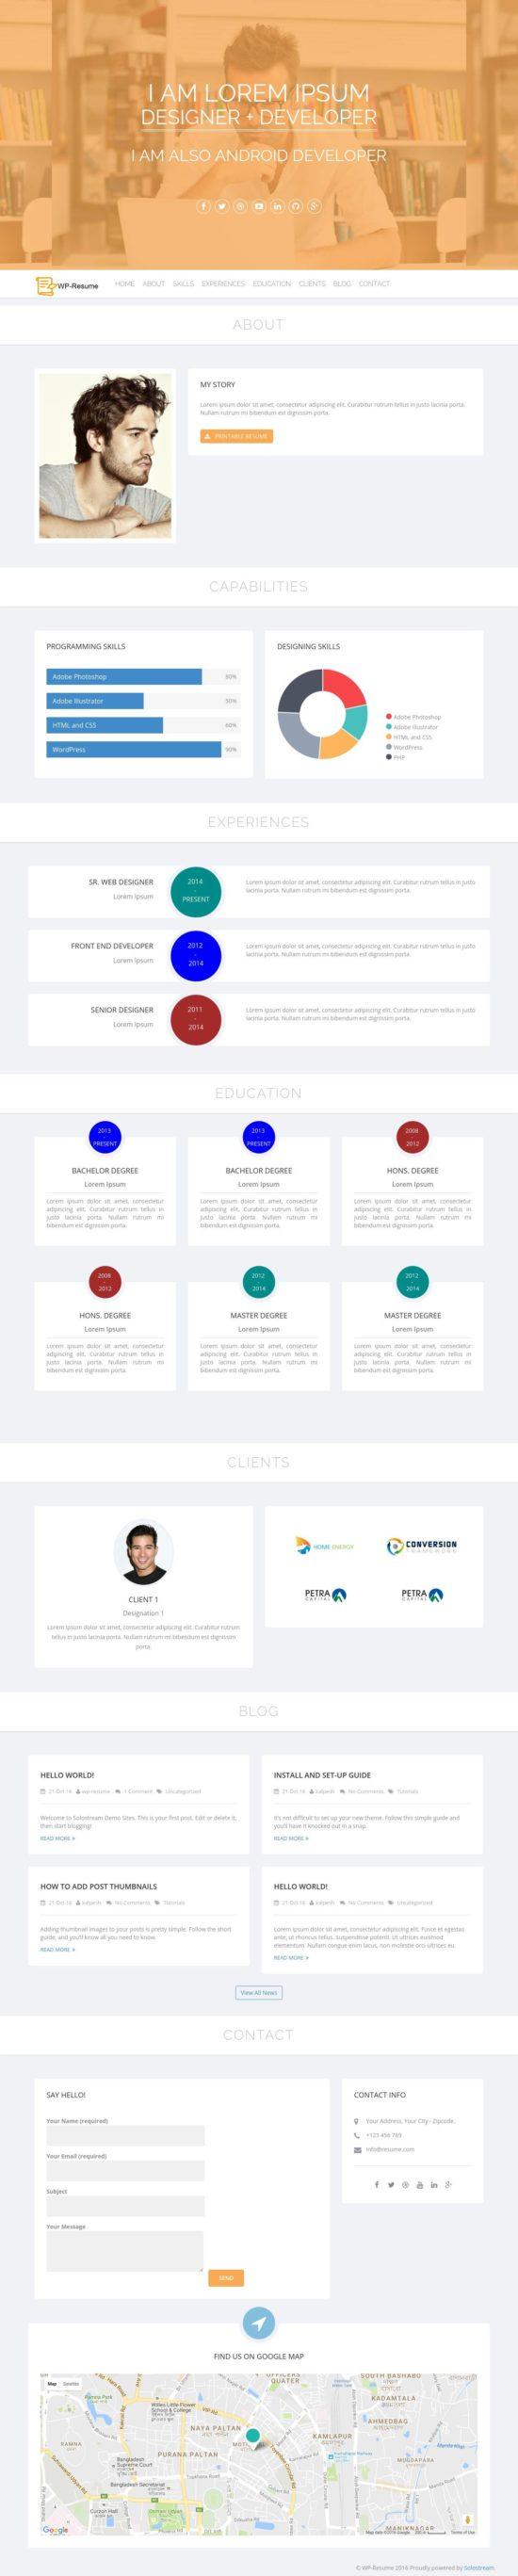 wp resume solostream wordpress theme 01 550x2735 - WP-Resume WordPress Theme